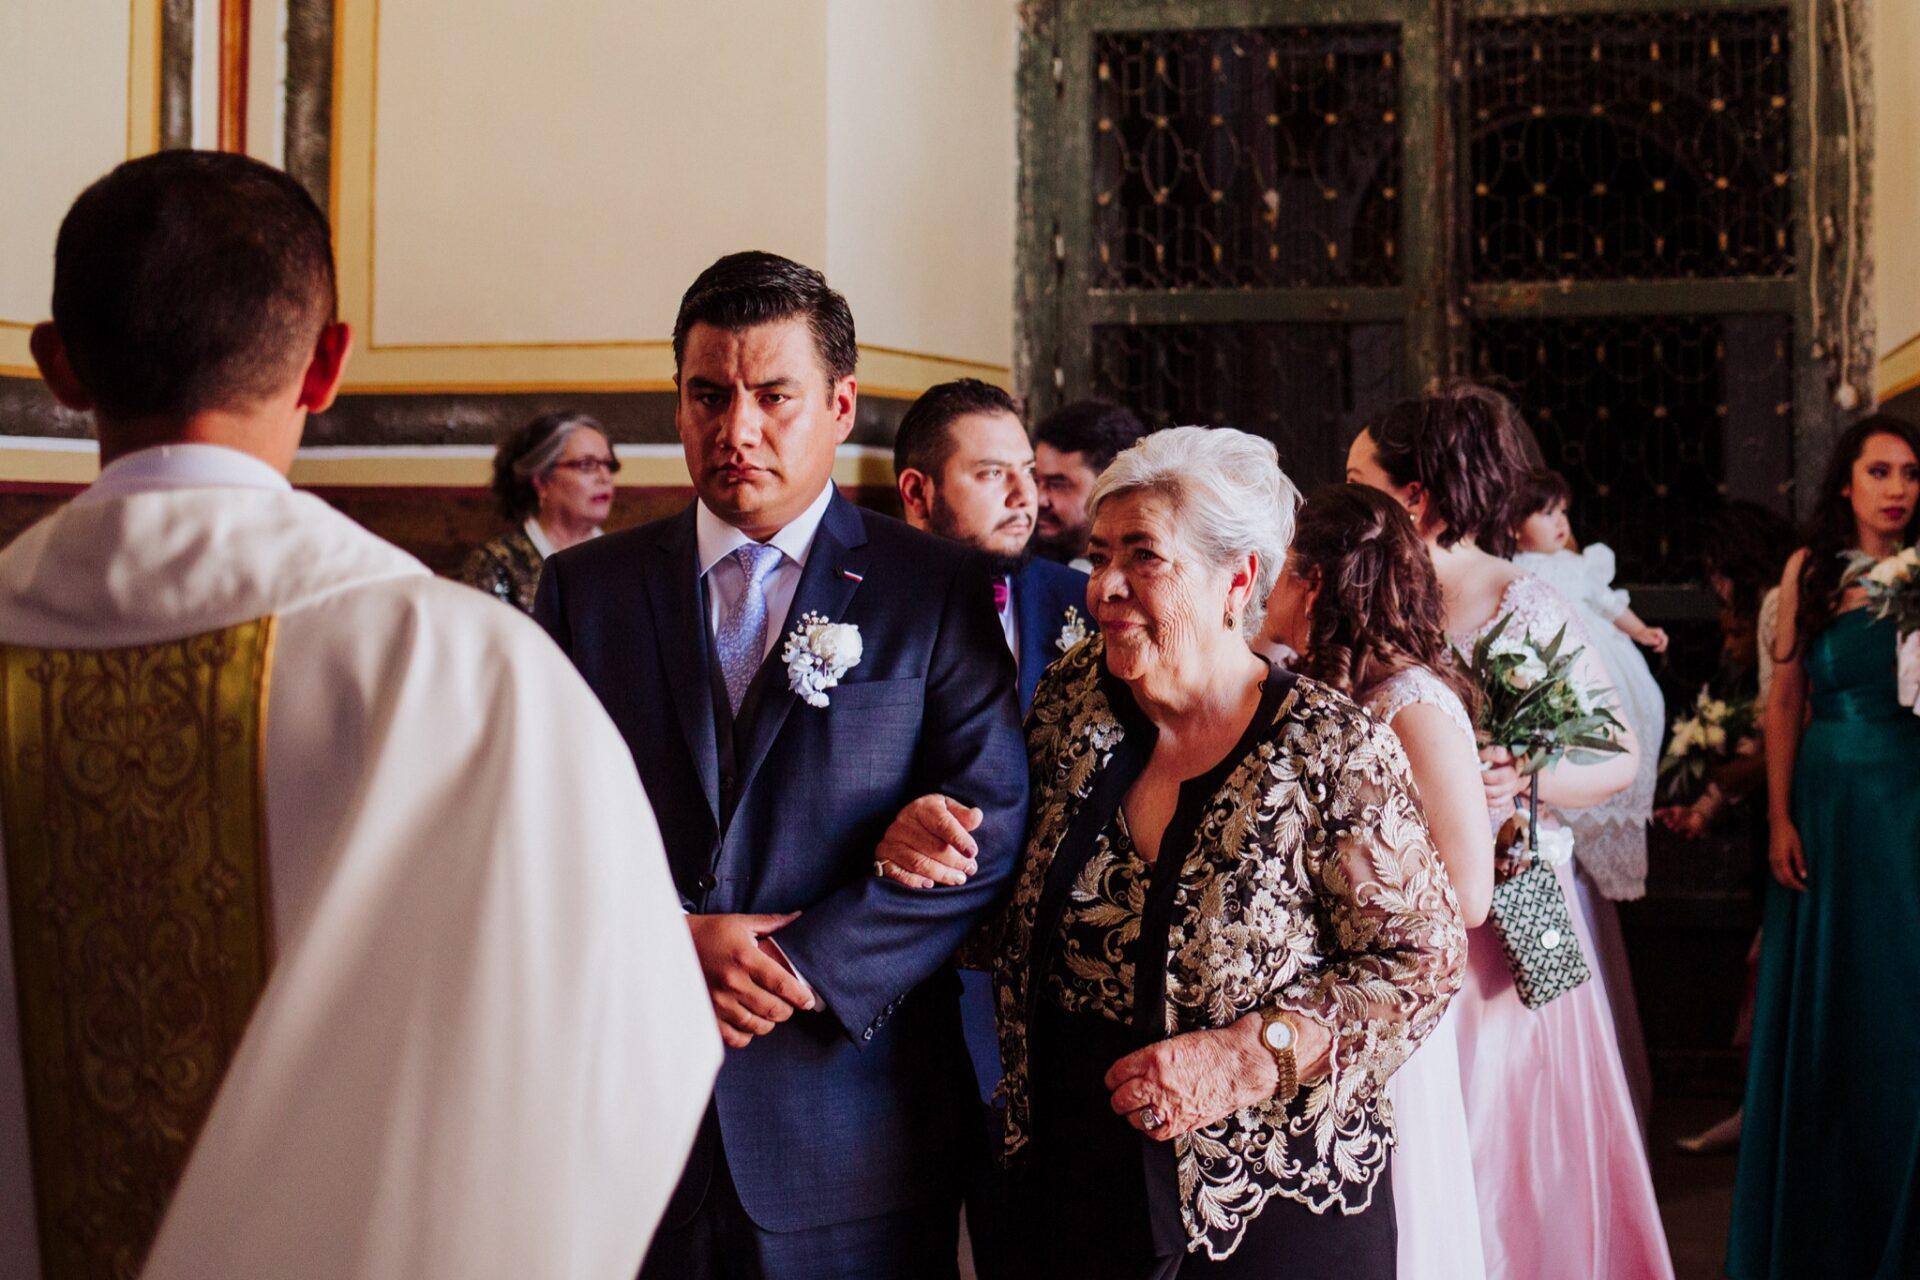 javier_noriega_fotografo_bodas_centro_platero_zacatecas_wedding_photographer3